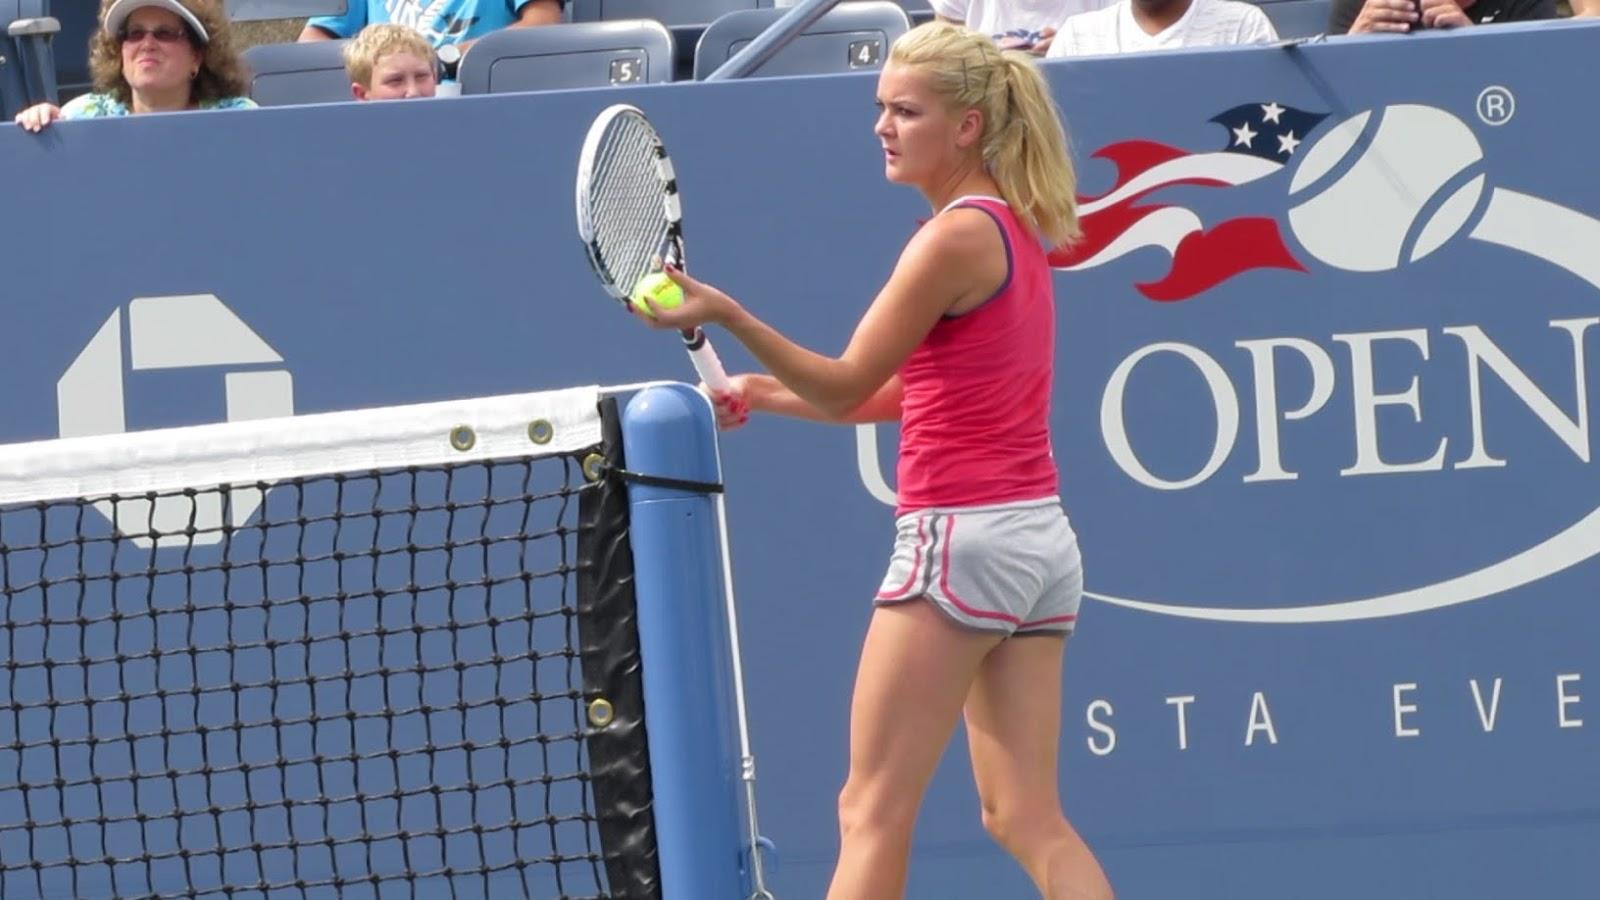 Agnieszka radwanska hot as hell at practice 4